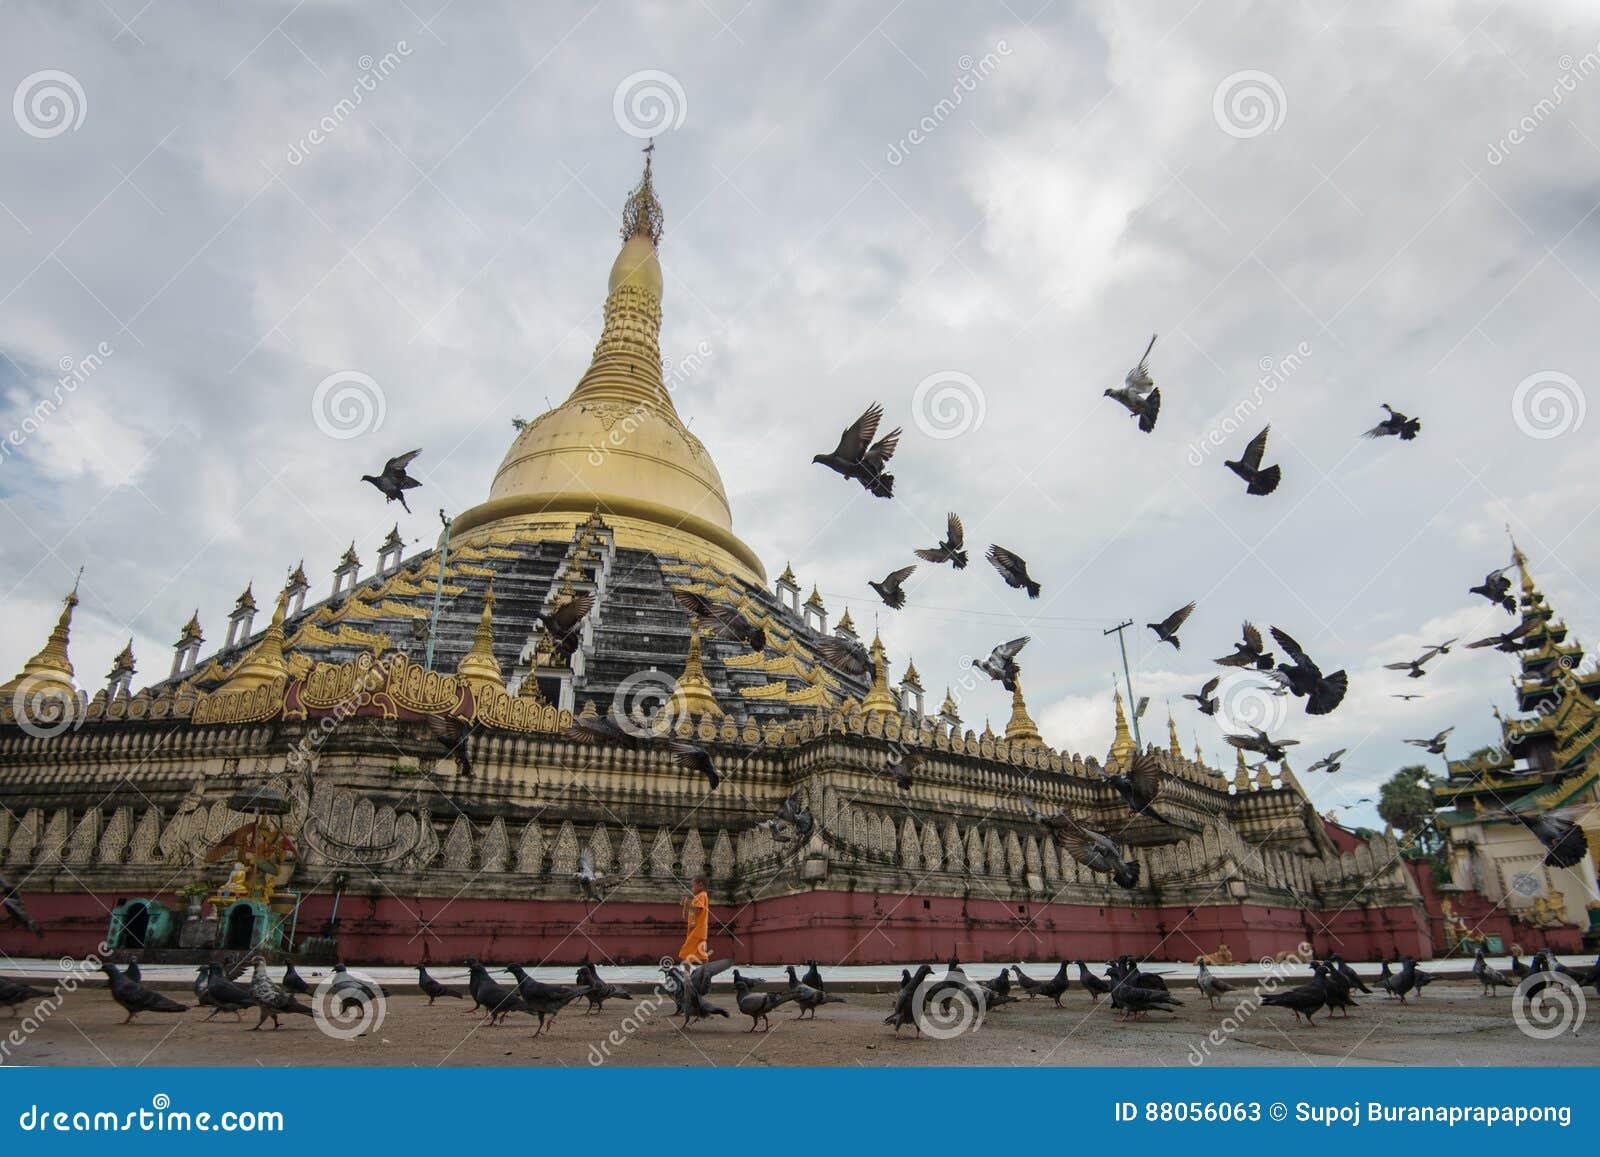 Paya de Mahazedi avec le pigeon la plus grande pagoda dans le bago, myanmar